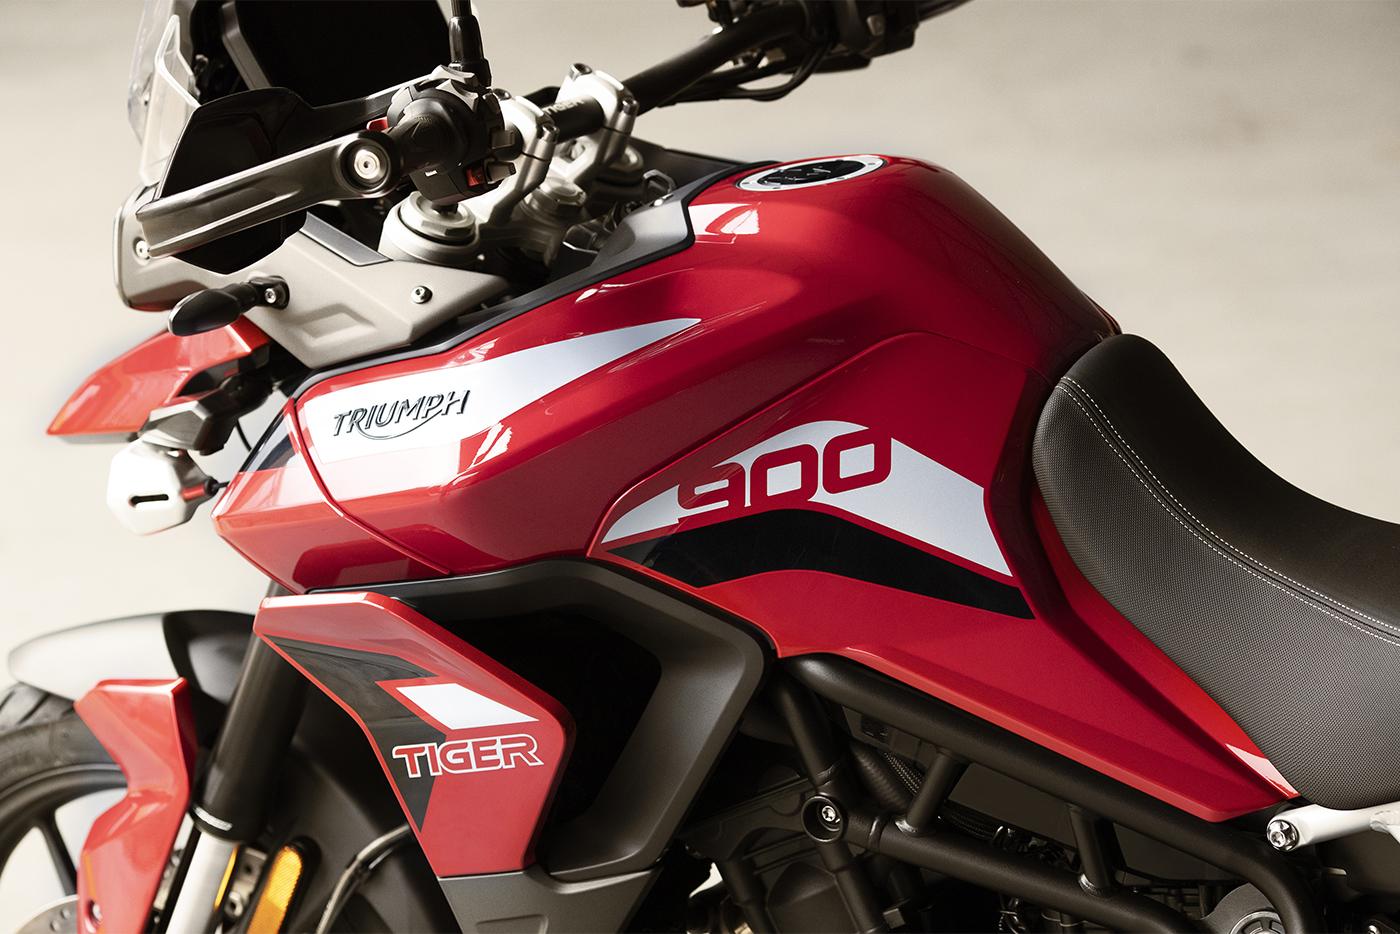 2020-triumph-tiger-900-10.jpg